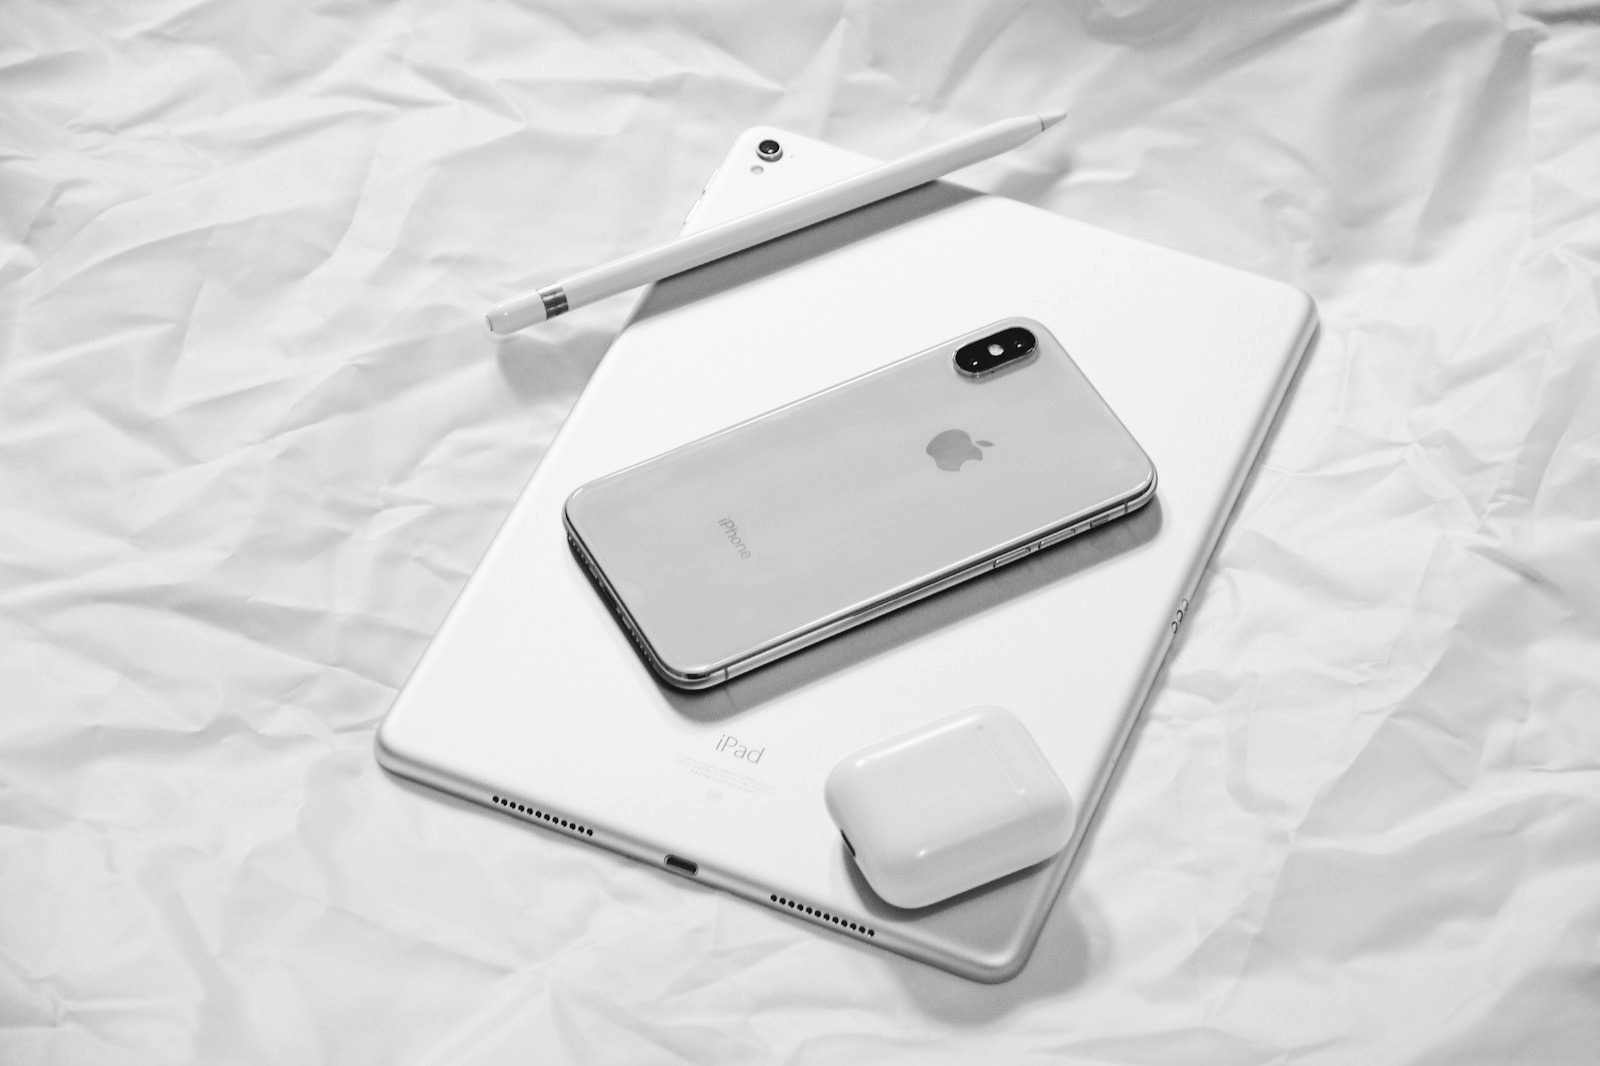 Eleven x 517447 unsplash ipadpro applepencil iphonex airpods